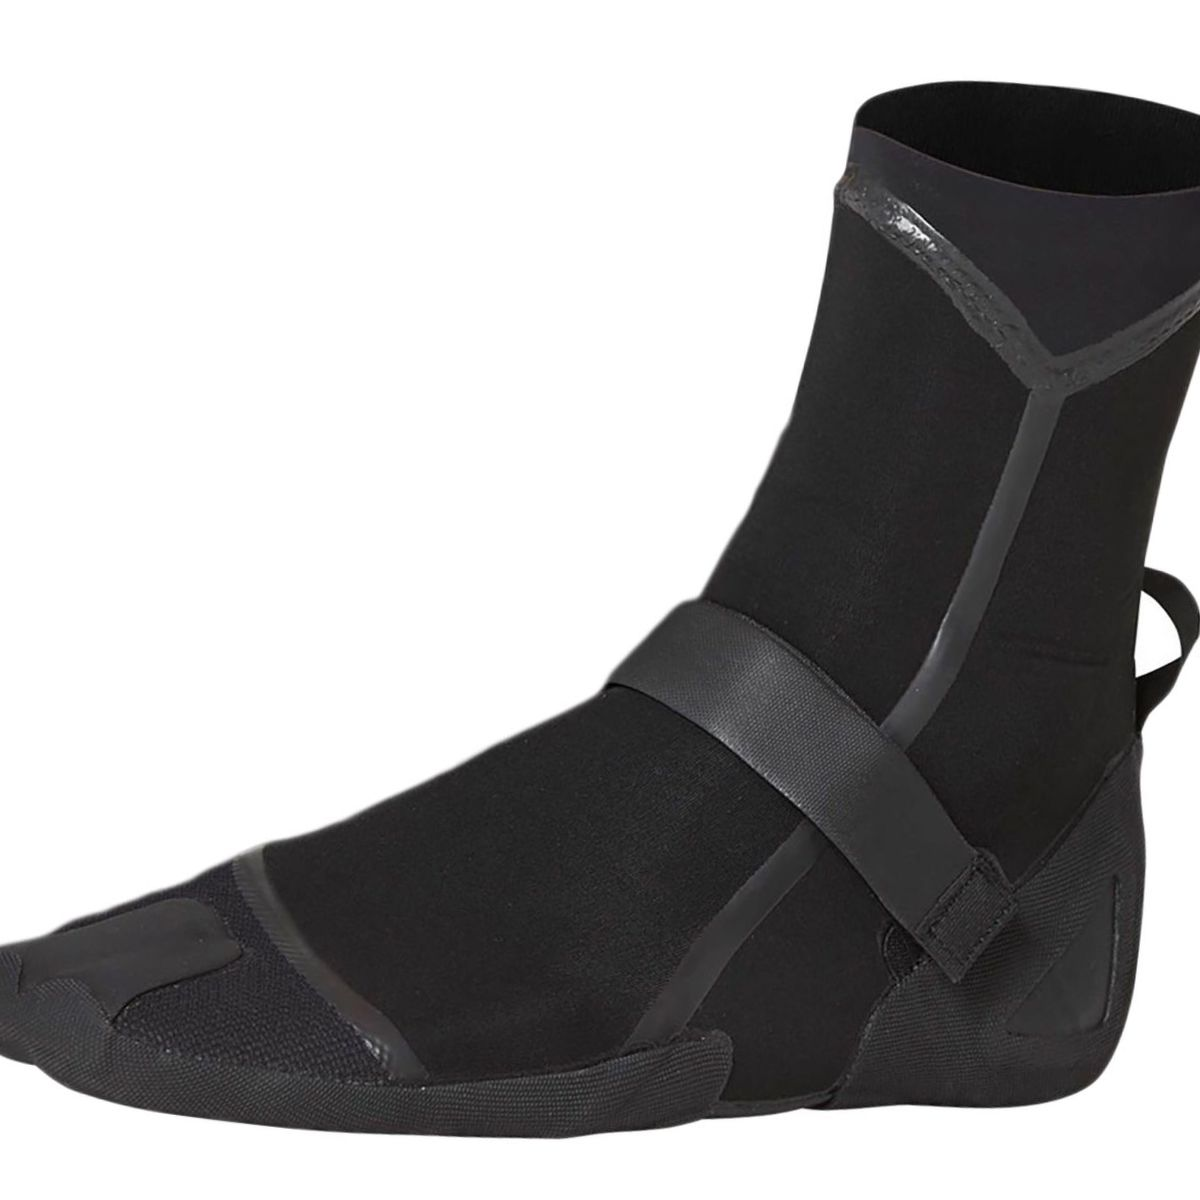 Billabong 7mm Furnace Carbon Ultra Split Toe Bootie - Men's